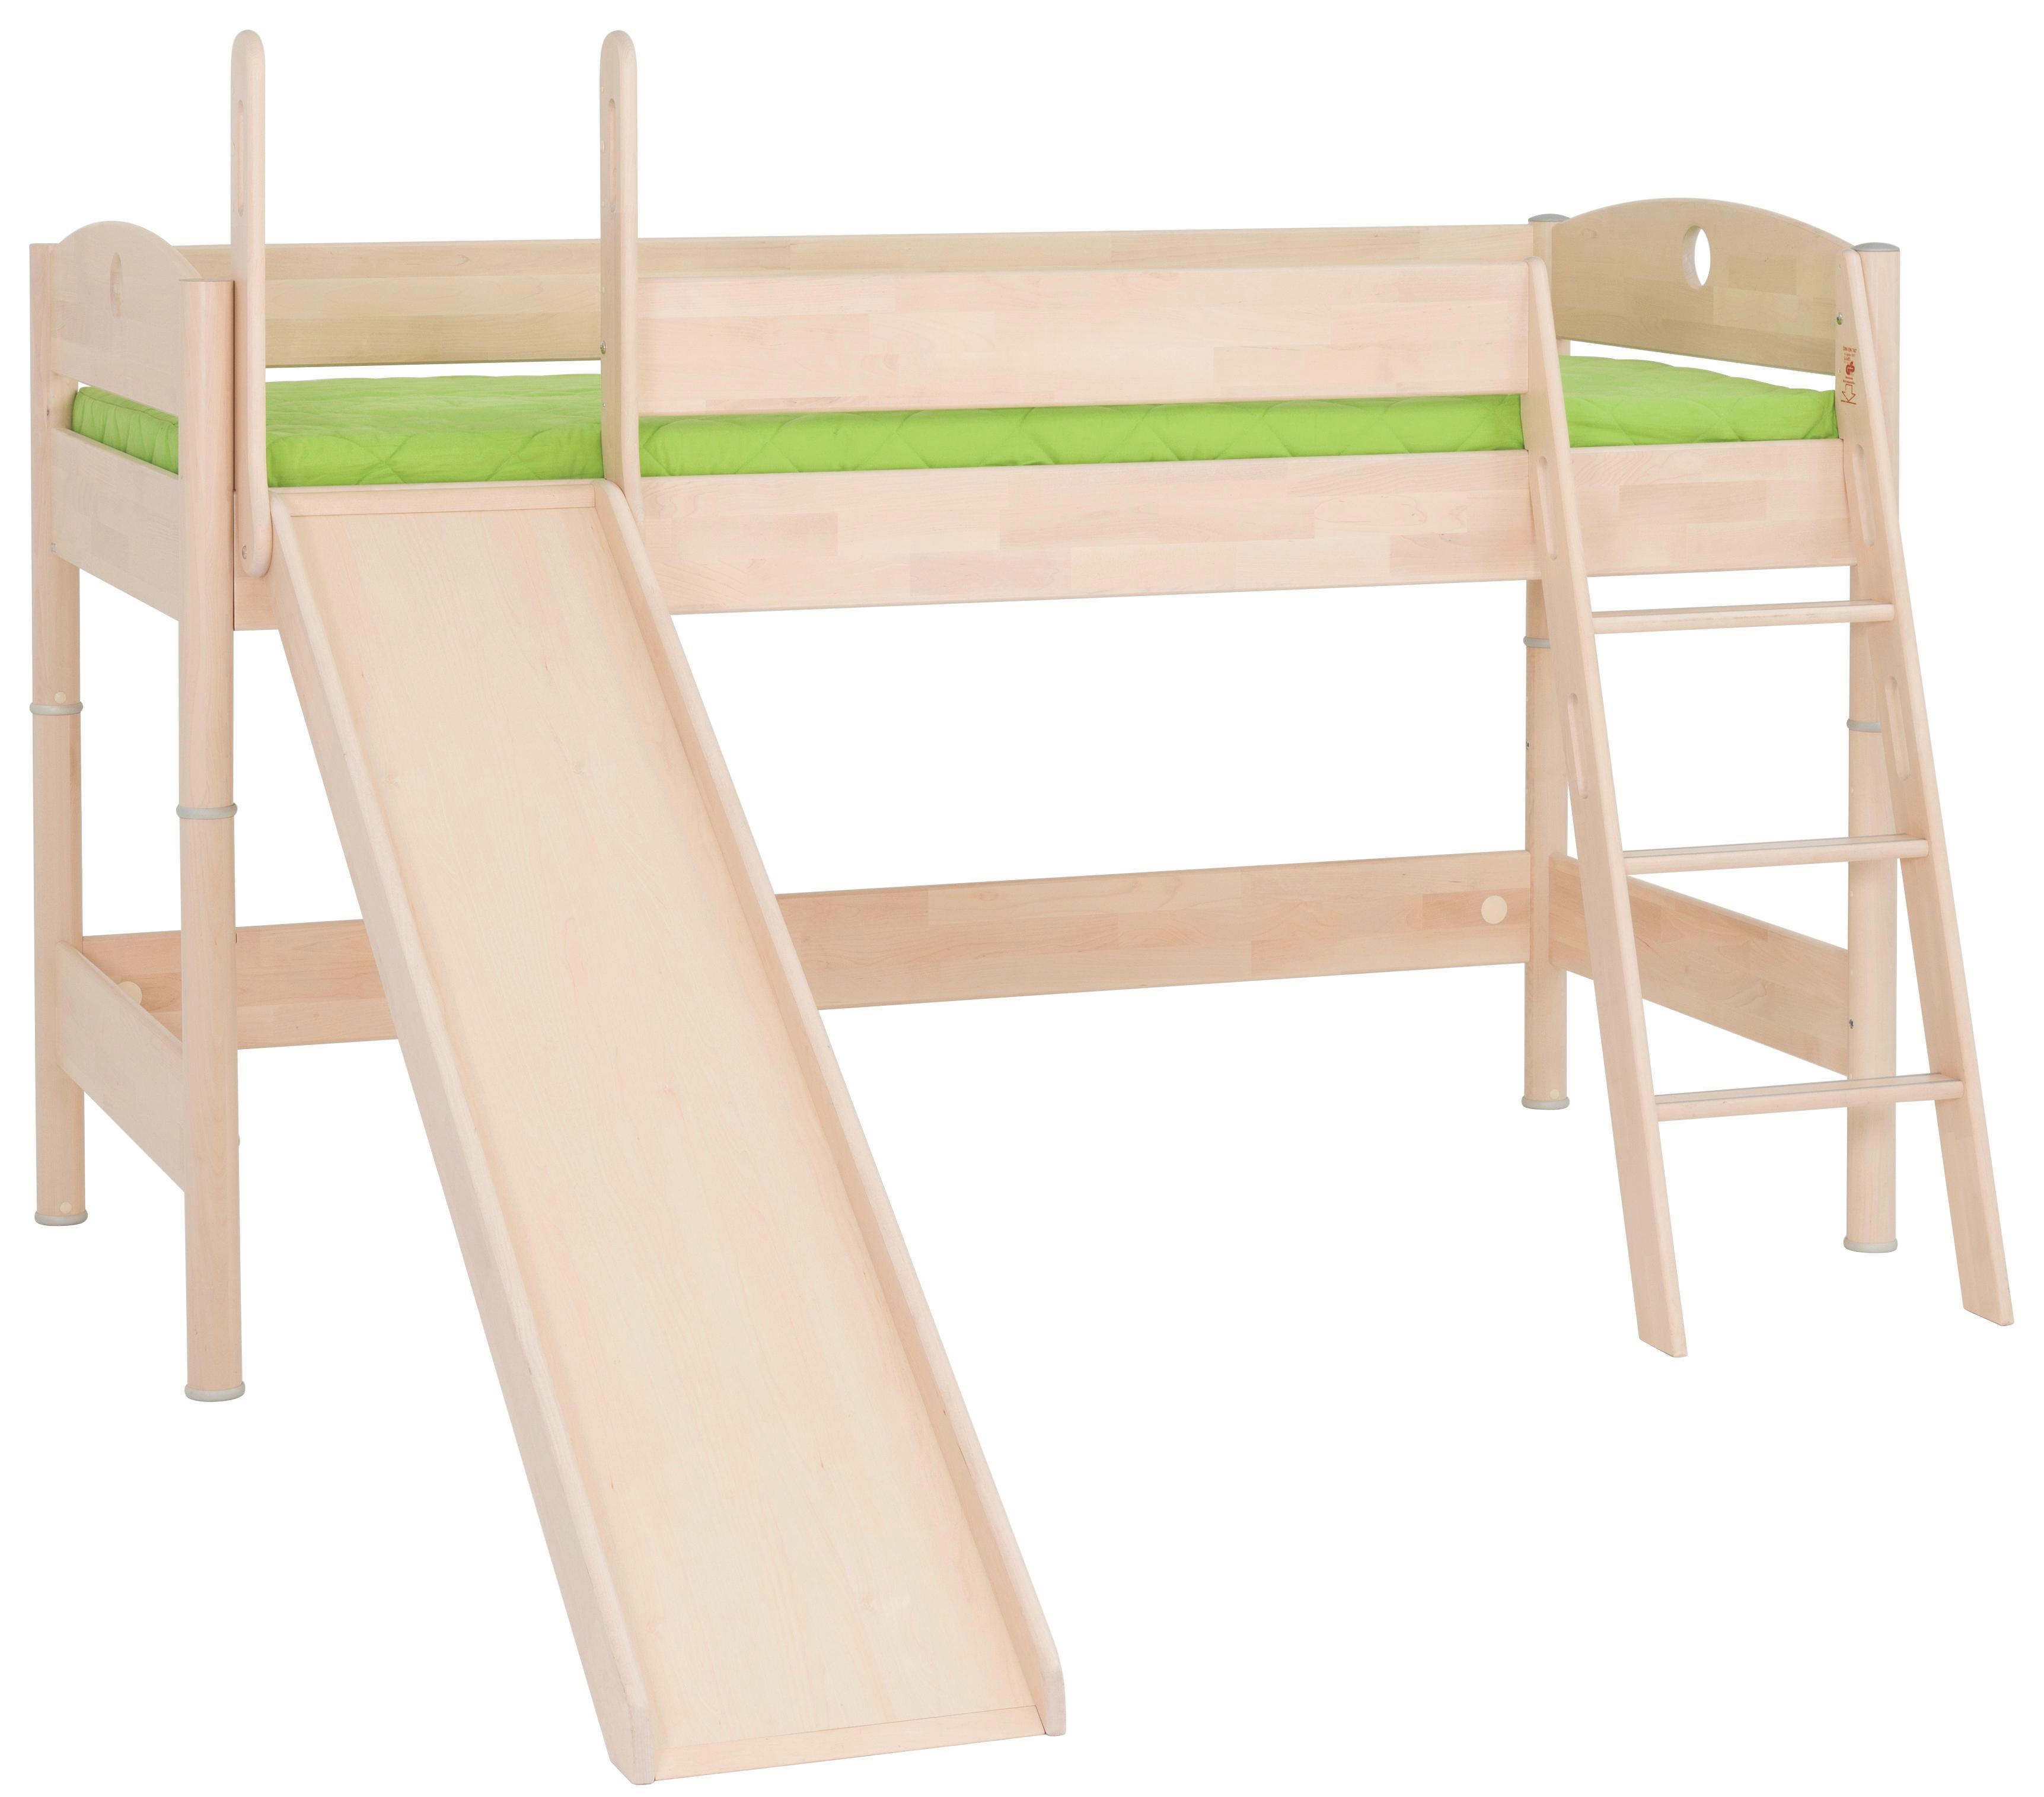 SPIELBETT Birke massiv Birkefarben - Birkefarben, Design, Holz (237,3/149,7/211,5cm) - PAIDI